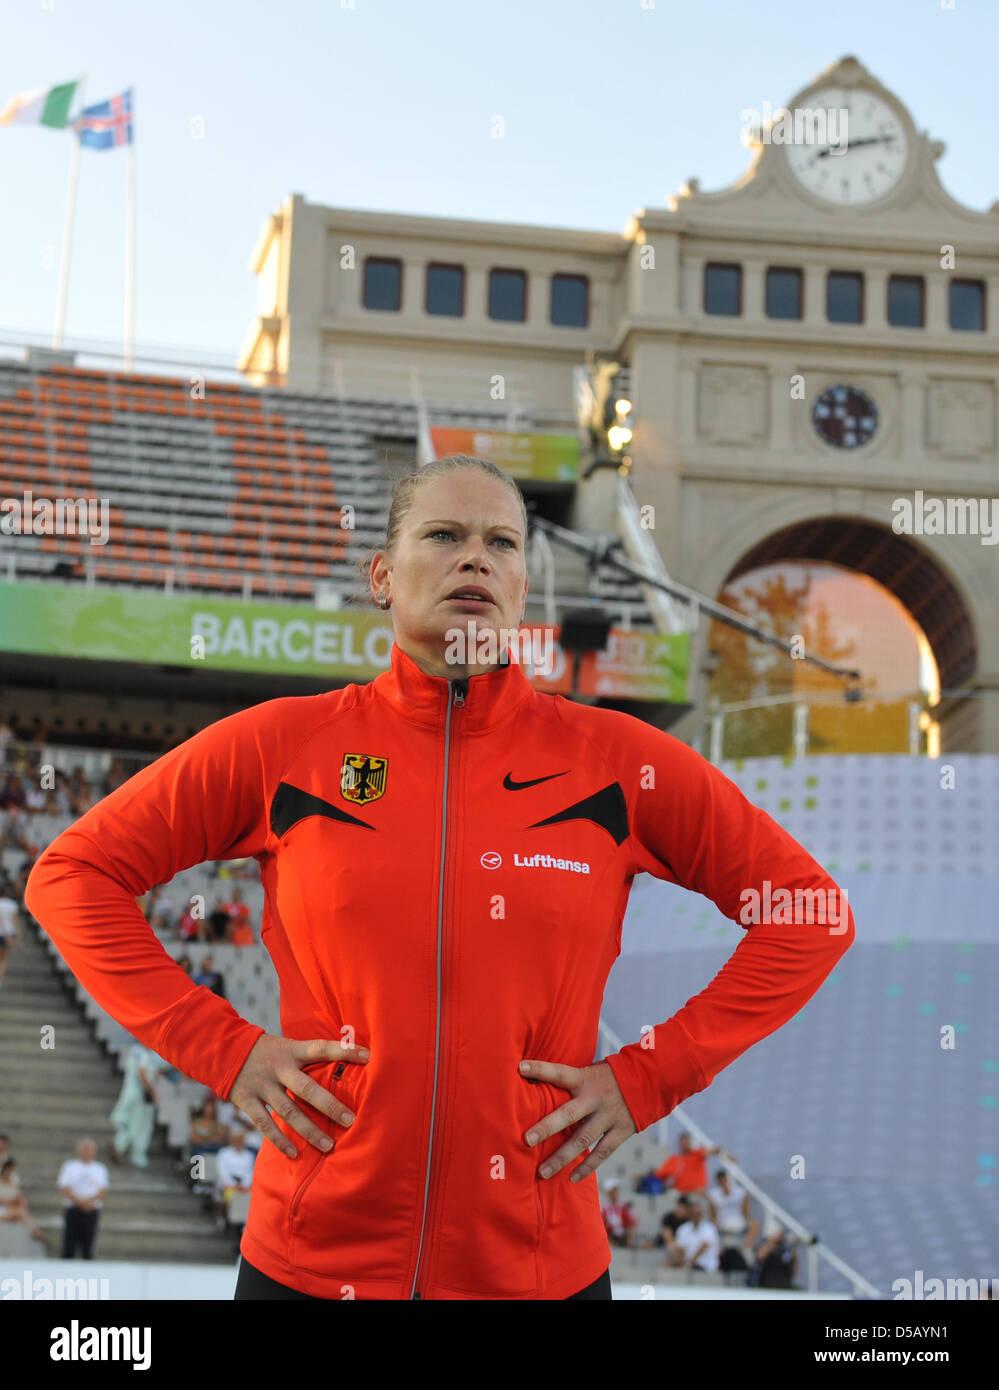 Shot put final at the European Athletics Championships in Barcelona, Spain, 27 July 2010. German shot putter Nadine - Stock Image